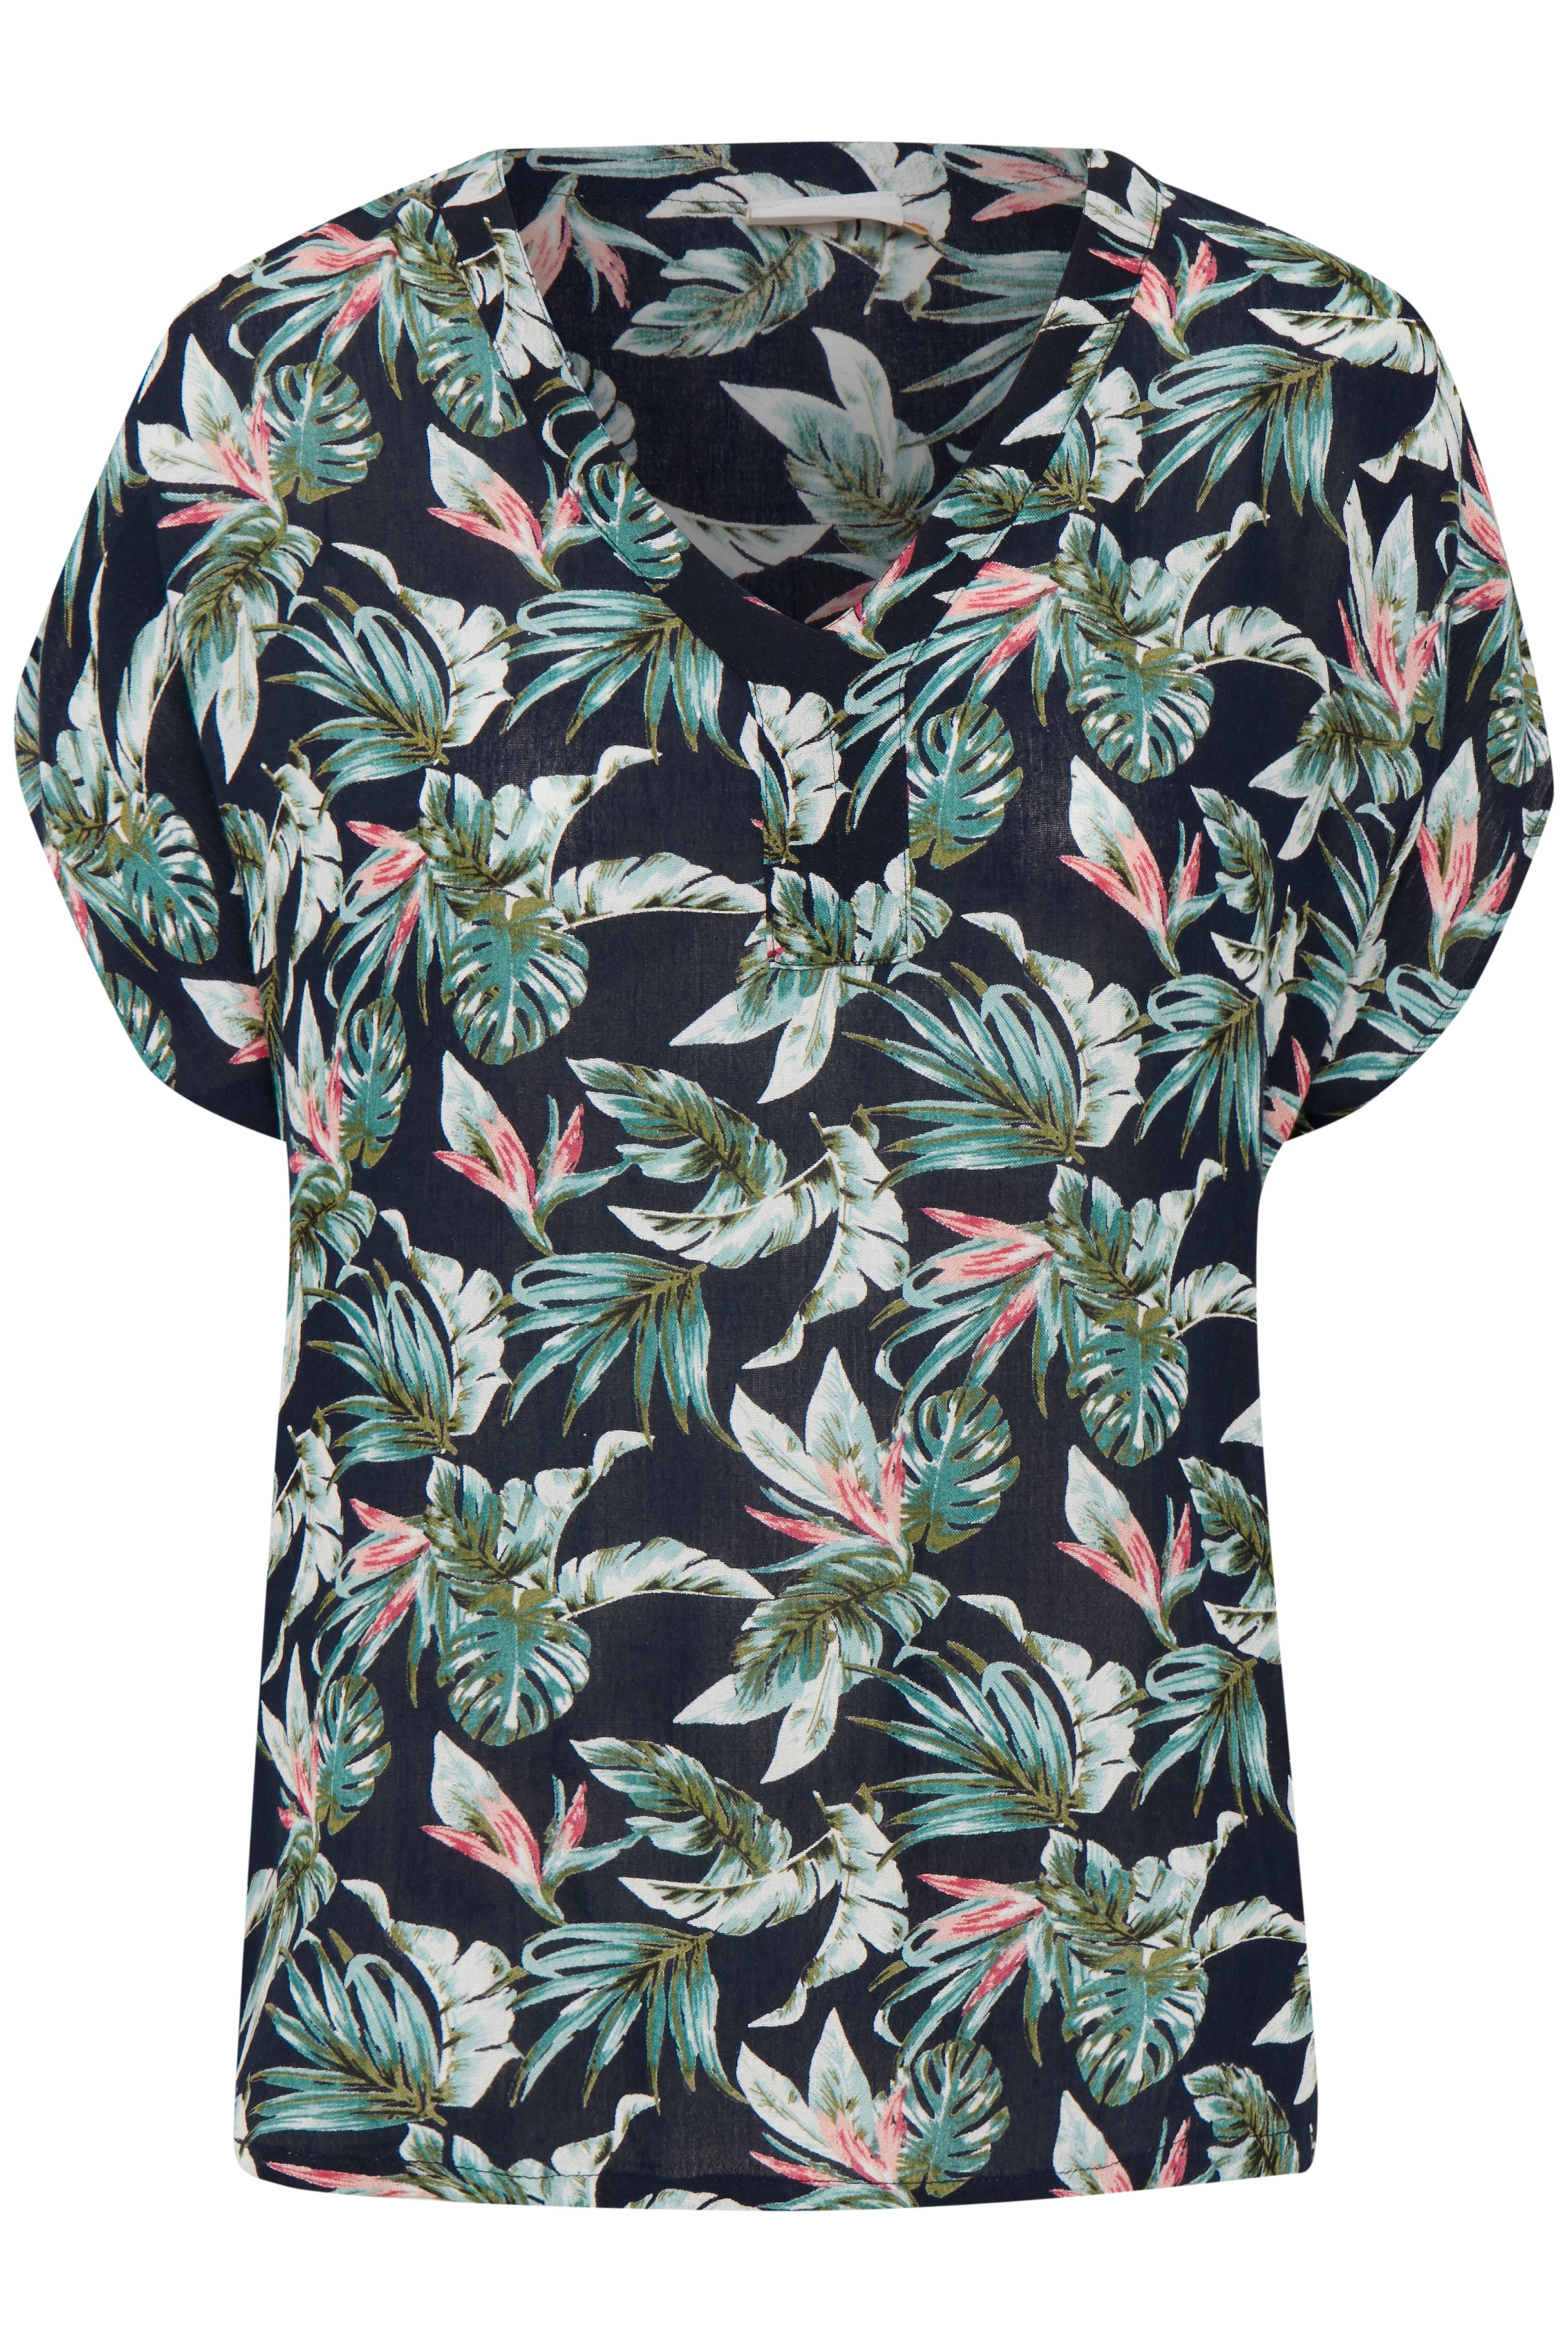 Marineblå/grøn Kortærmet bluse fra Kaffe – Køb Marineblå/grøn Kortærmet bluse fra str. 34-46 her